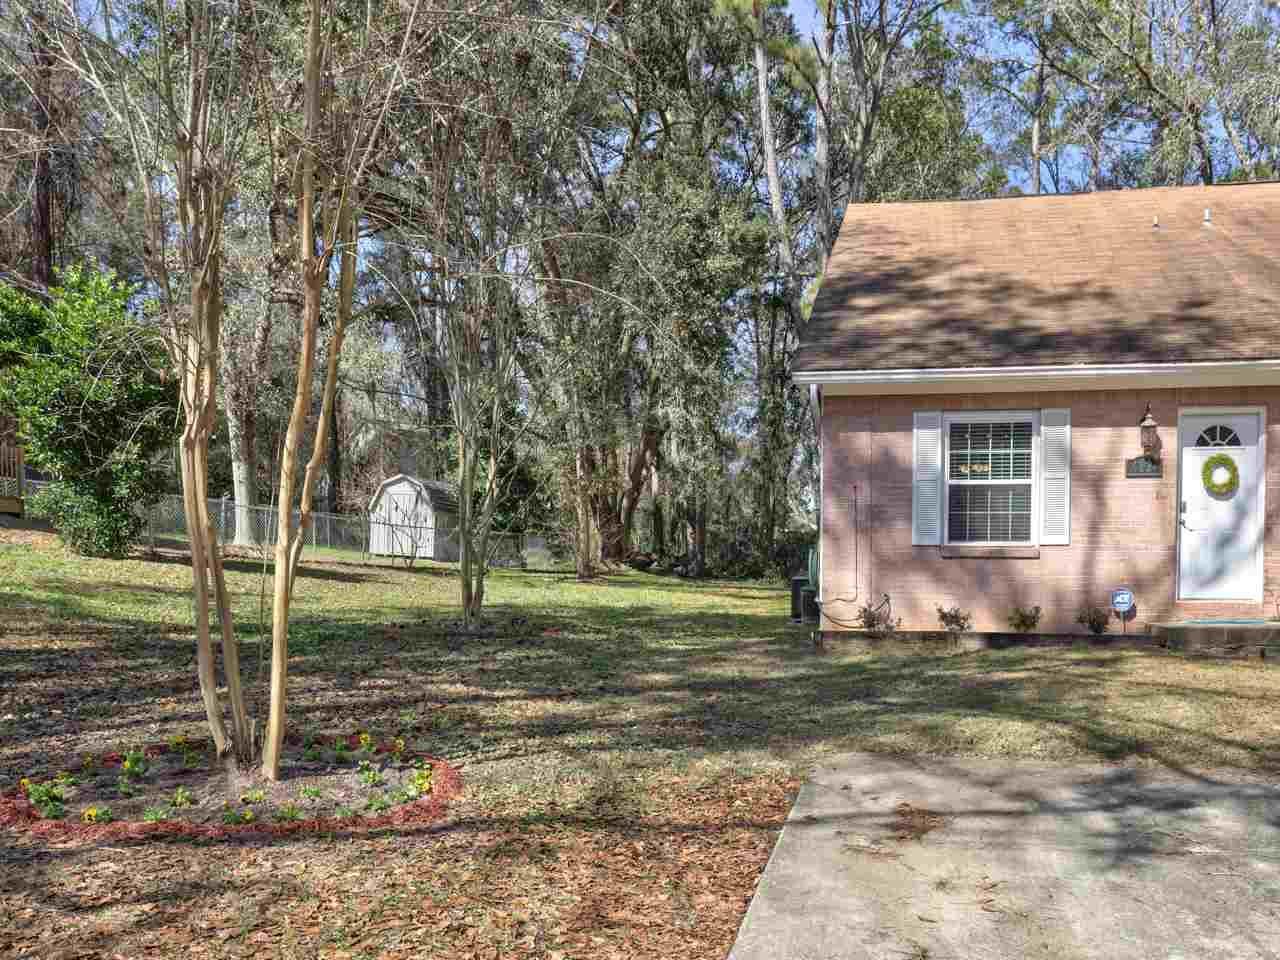 Photo of 4824 Easy Street, TALLAHASSEE, FL 32303 (MLS # 328455)